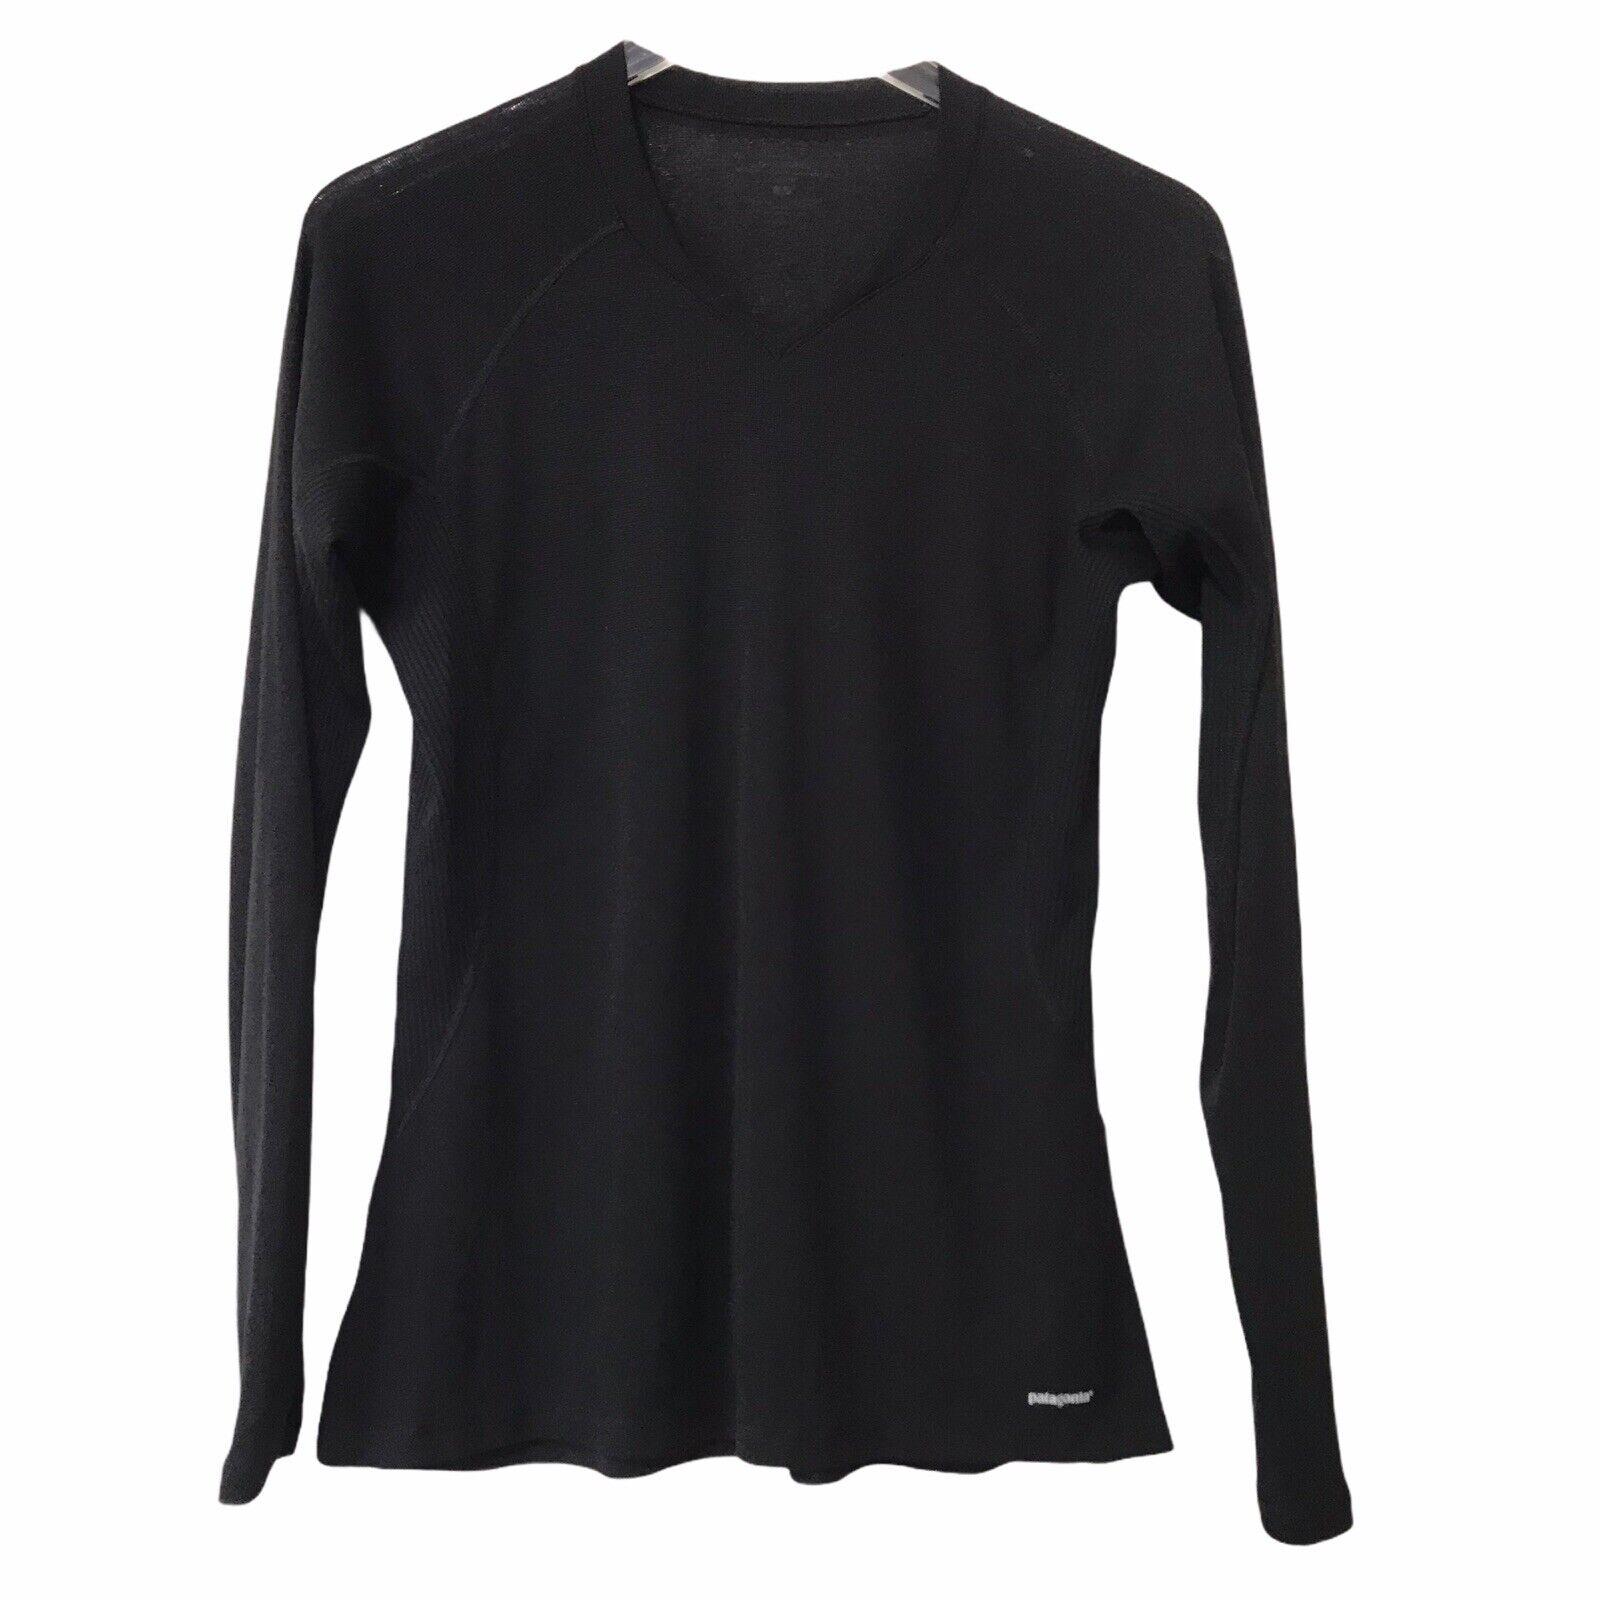 Patagonia Womens Size L Performance Base Layer Capilene Long Sleeve Shirt Black